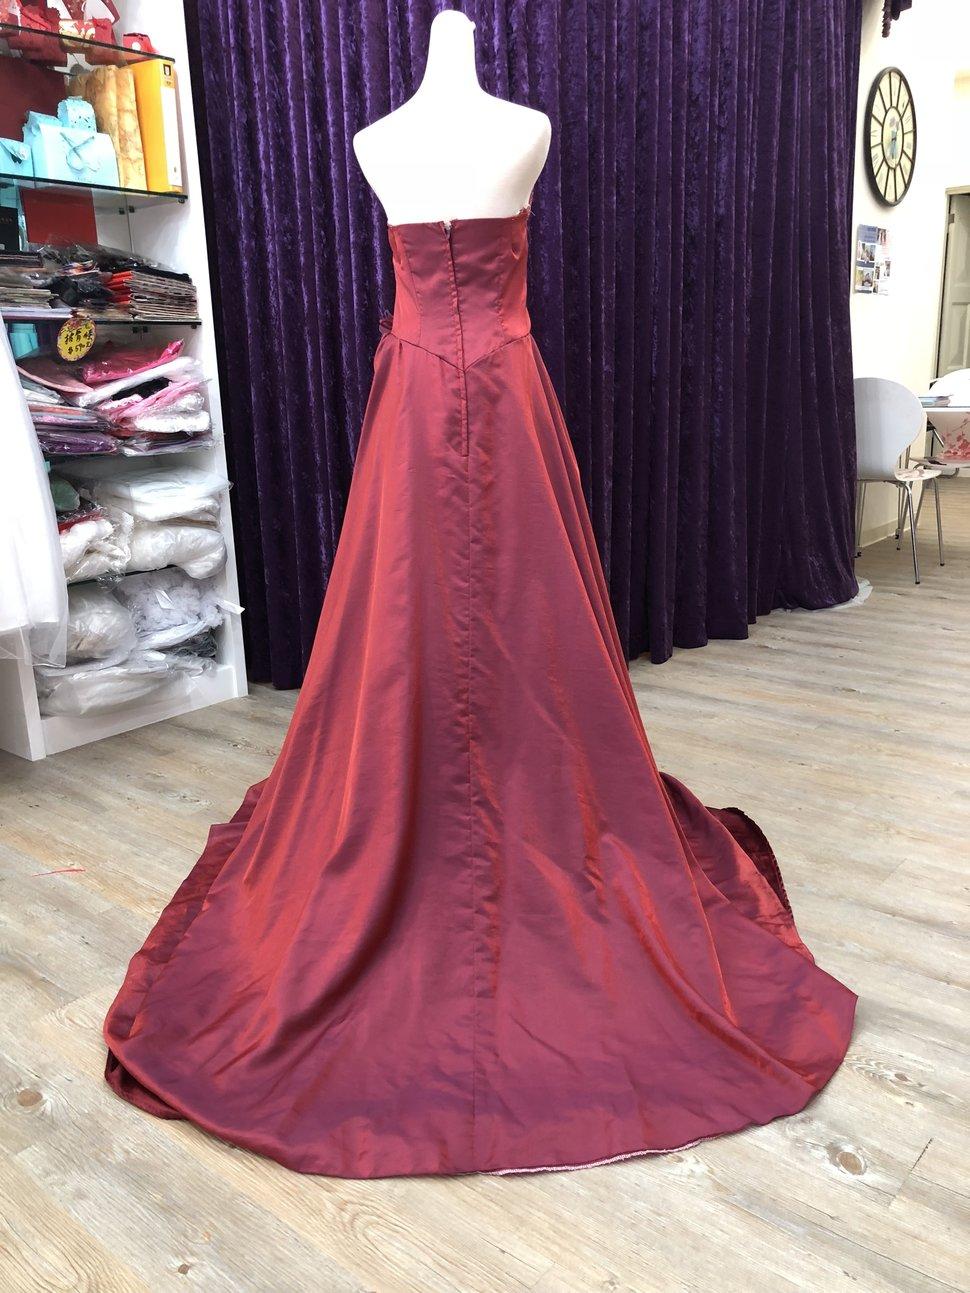 IMG_5231 - 全台最便宜-45DESIGN四五婚紗禮服《結婚吧》